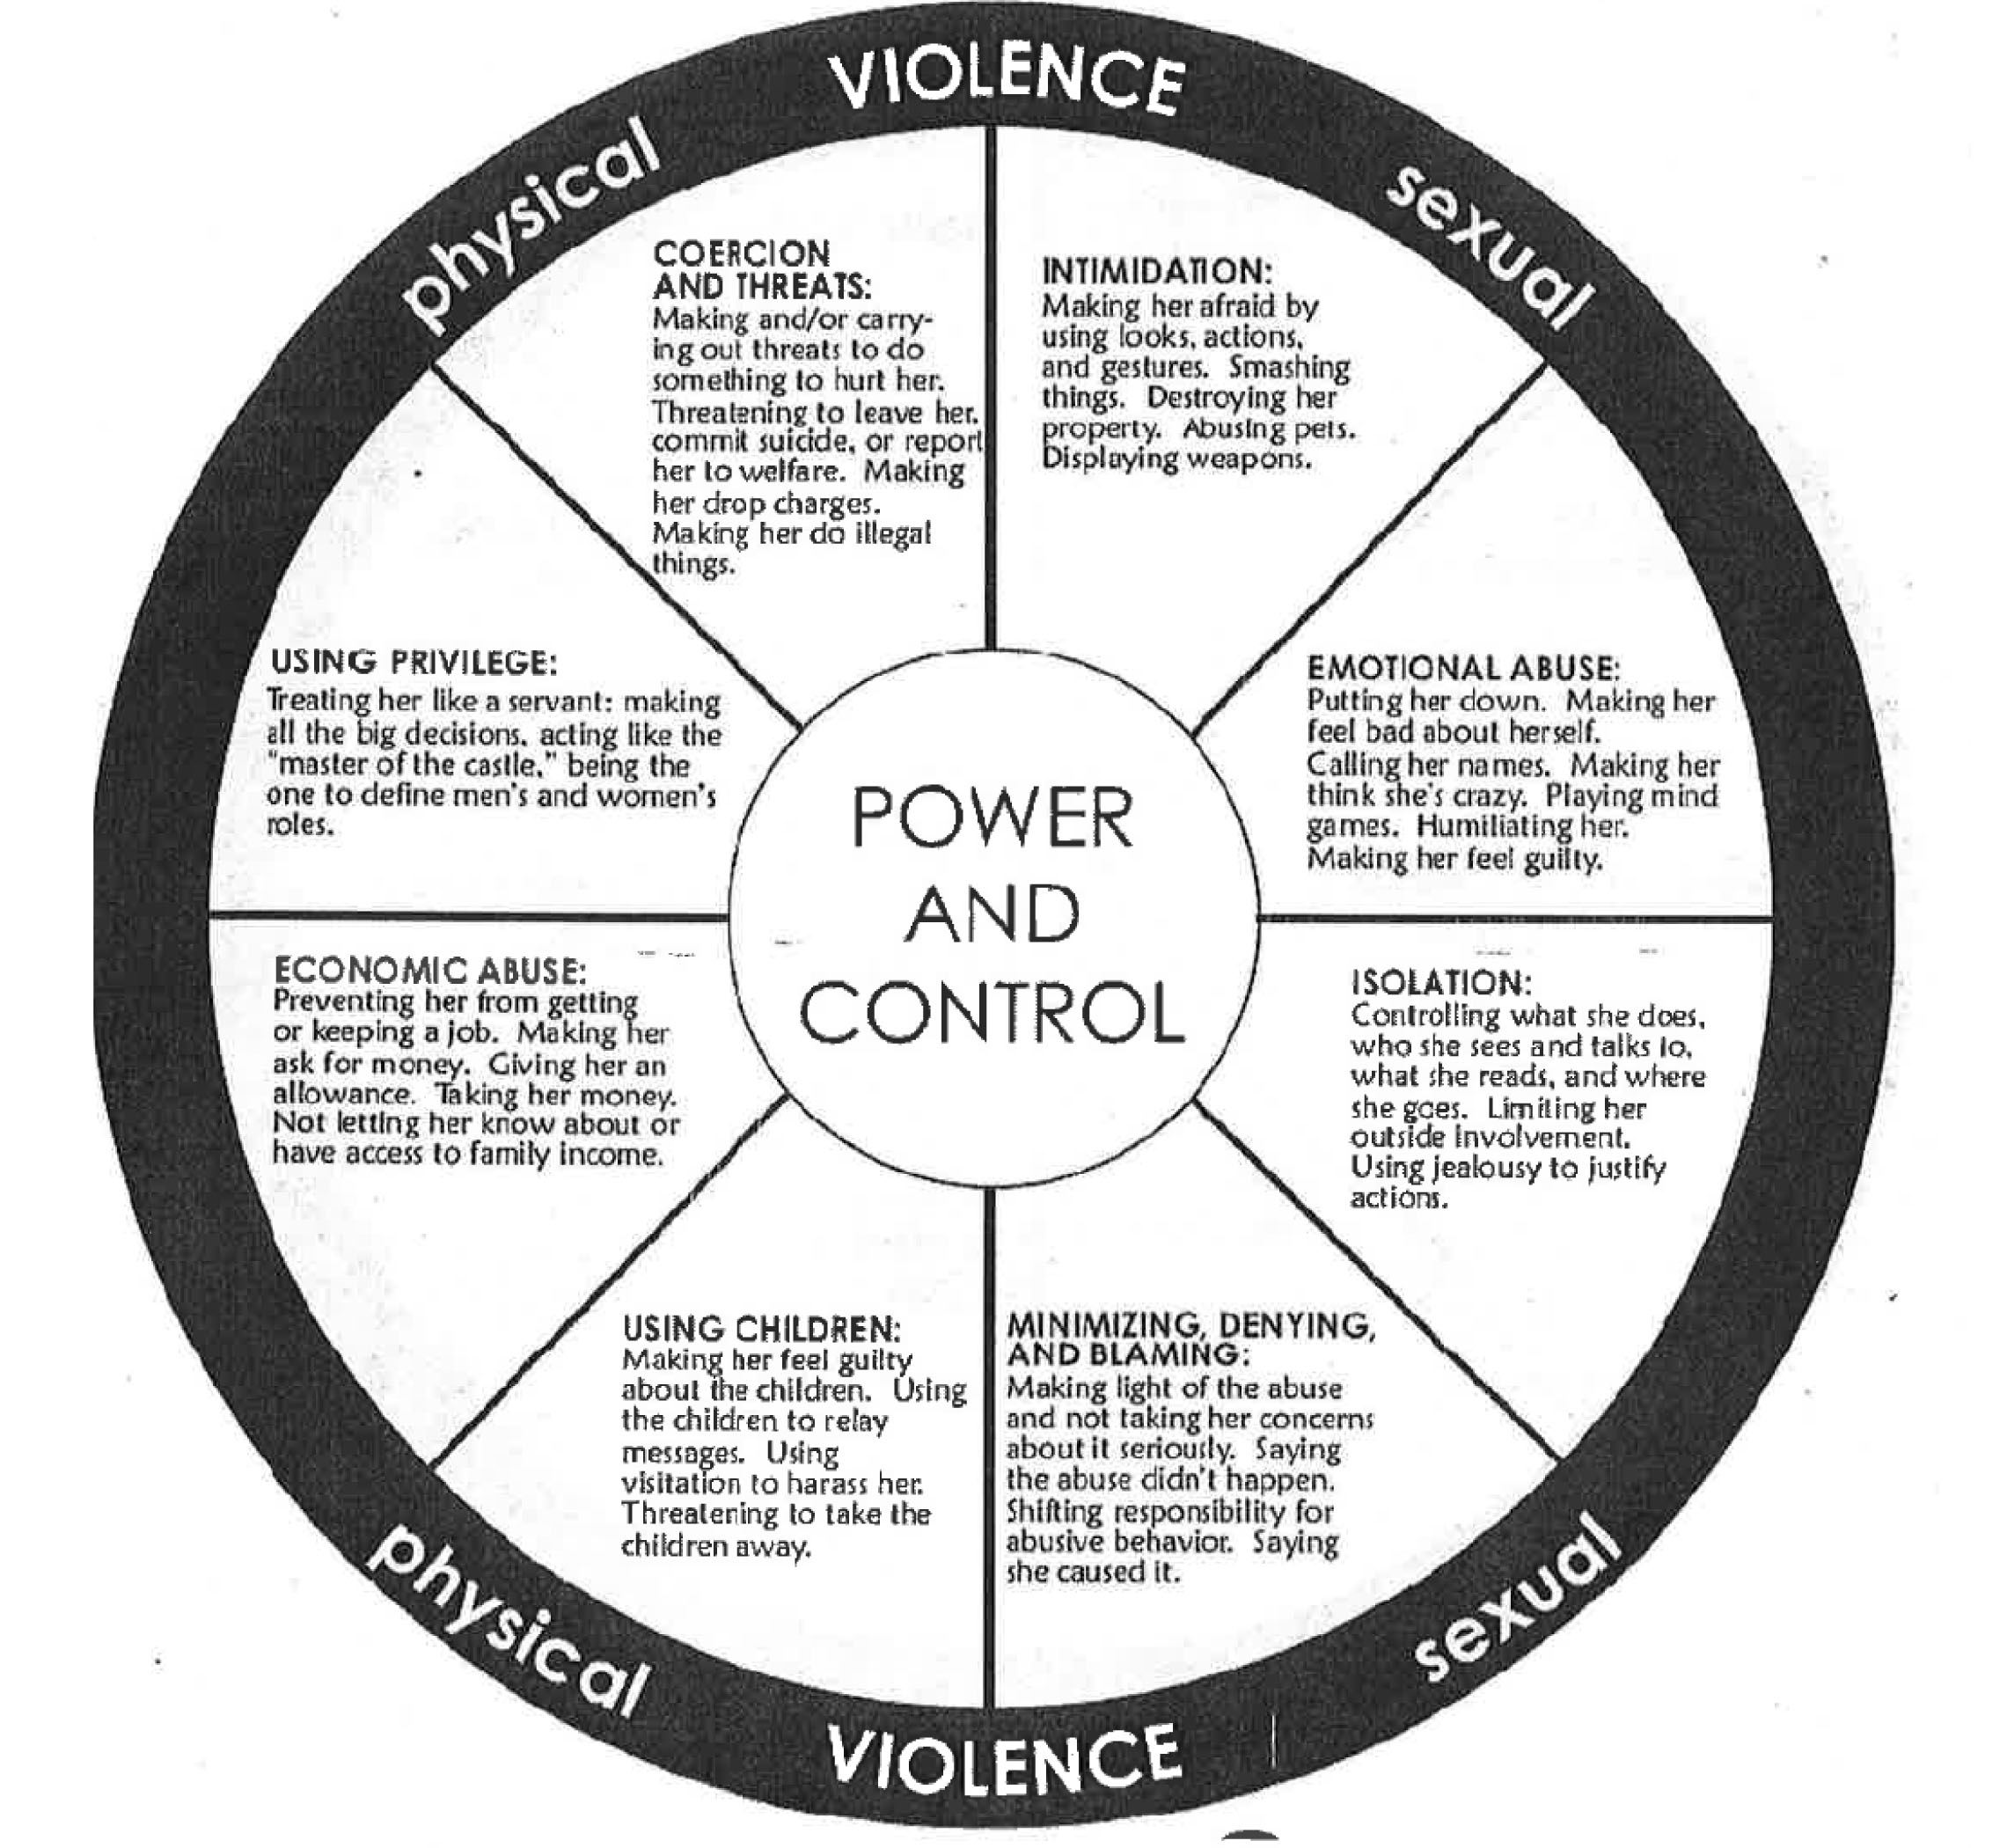 Sexually coercive behavior definition